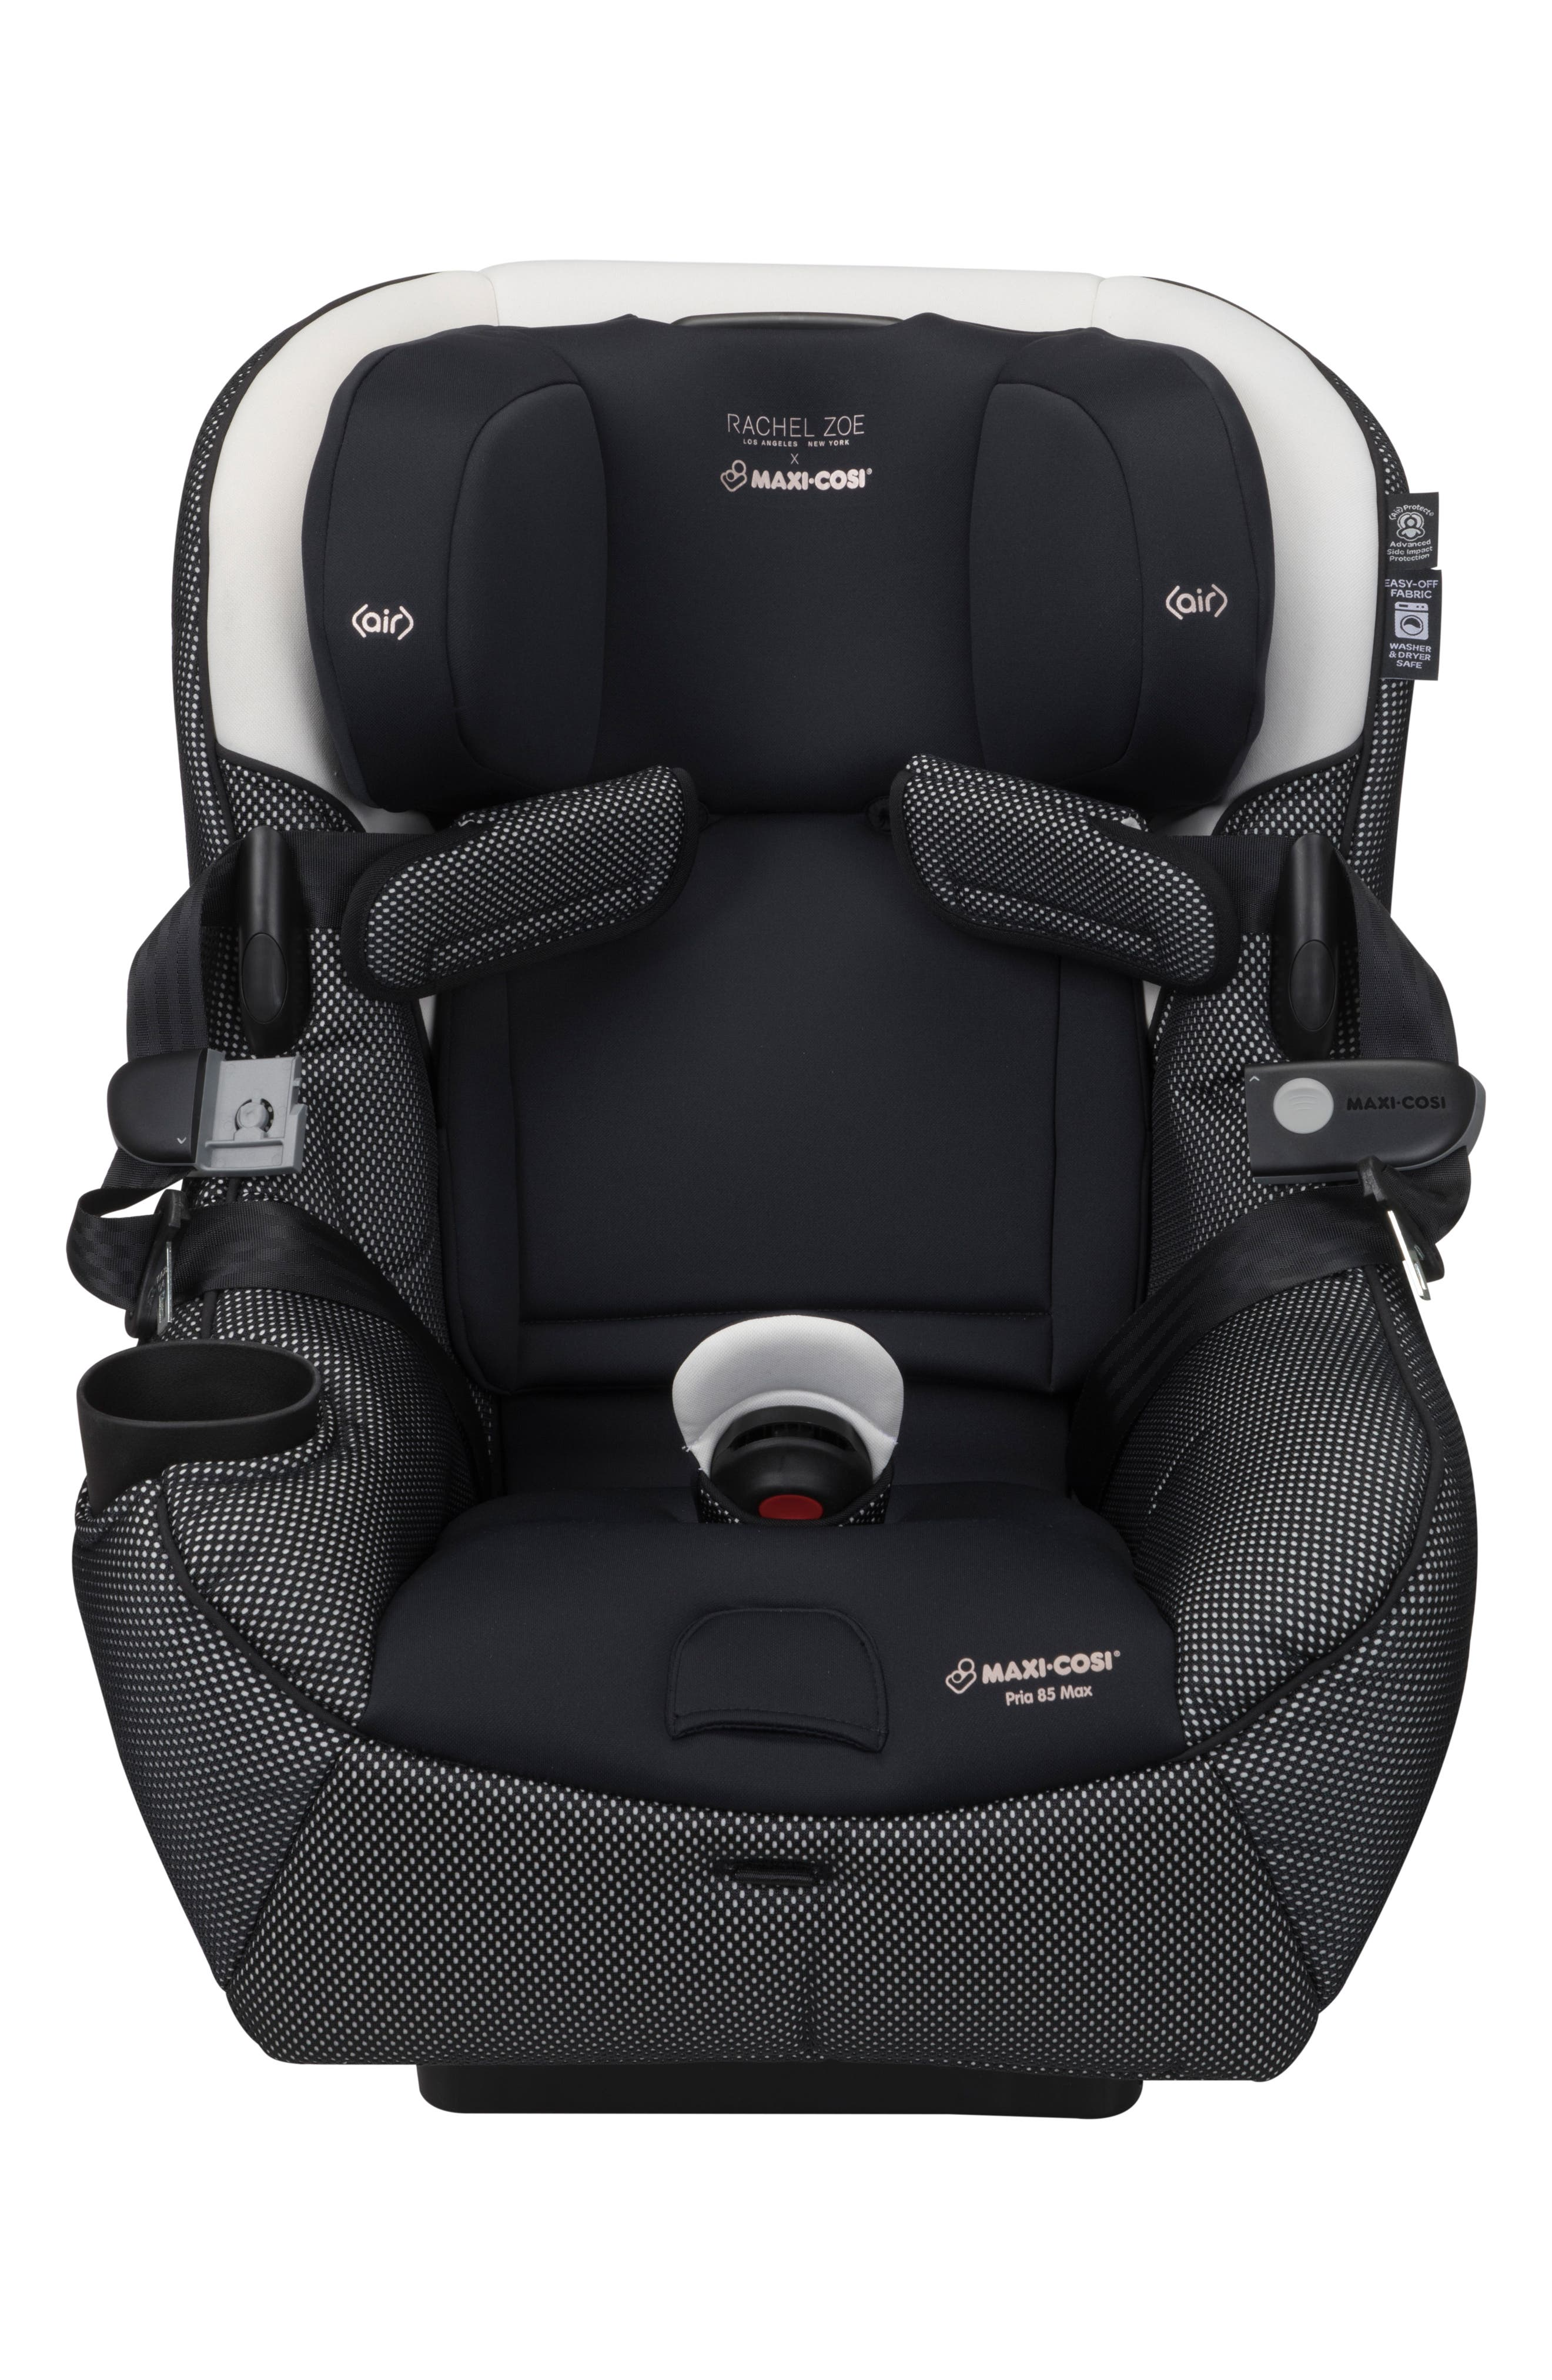 x Rachel Zoe Pria<sup>™</sup> 85 Luxe Sport Max Convertible Car Seat,                             Alternate thumbnail 3, color,                             Rz Luxe Sport